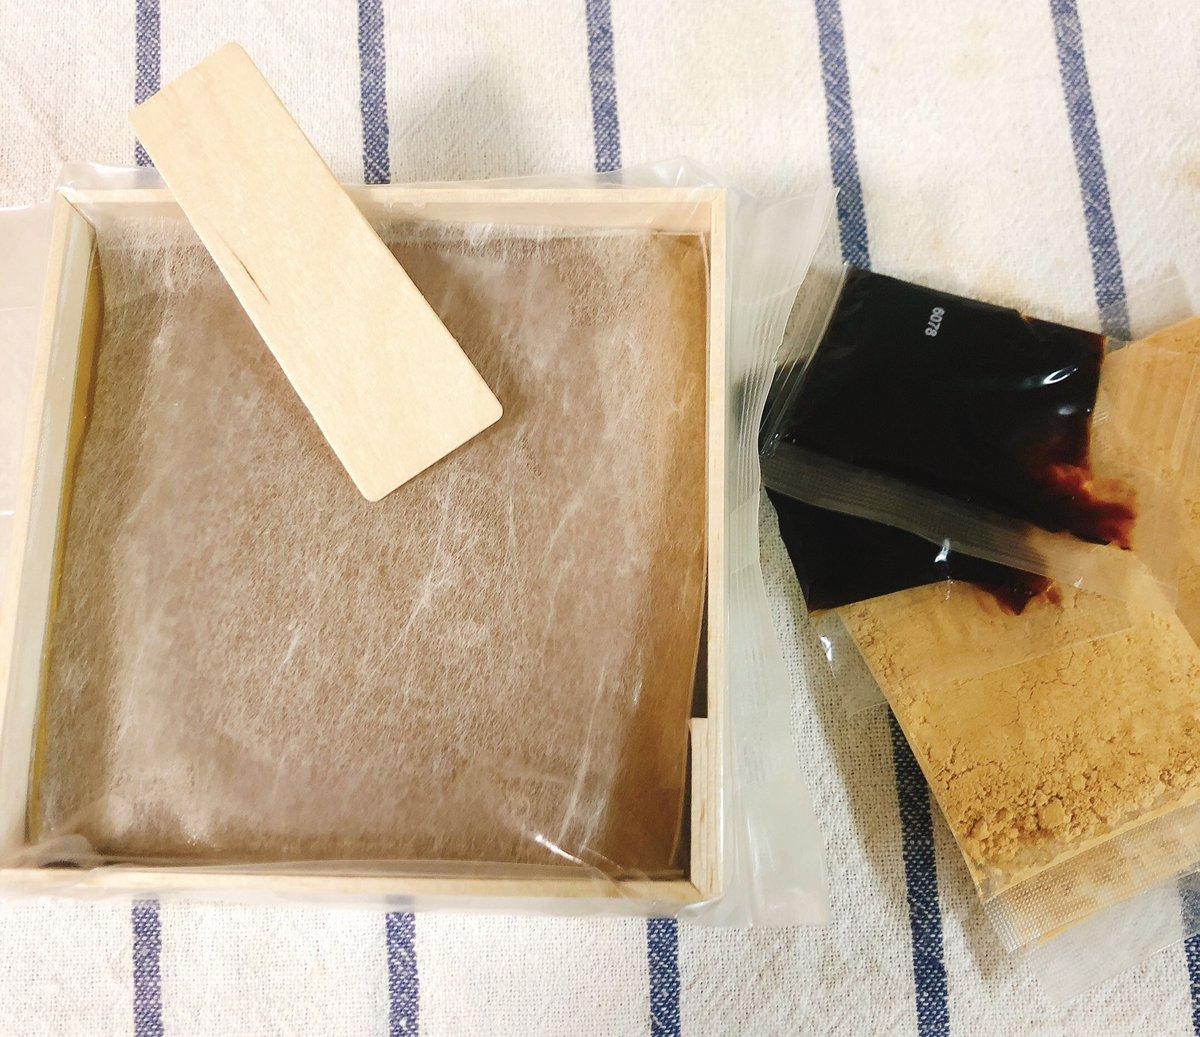 test ツイッターメディア - 関西で有名な和菓子屋さん  小倉山荘の新商品♬  『わらびもち』✨  上品な甘さと  心地良い舌ざわり💕  絶品です♬  大阪は本町で購入しました♬  #お腹ペコリン部 #デザート #ヘルシー #土曜日  https://t.co/KiJgtqOQSx https://t.co/N5bPgfPhNb